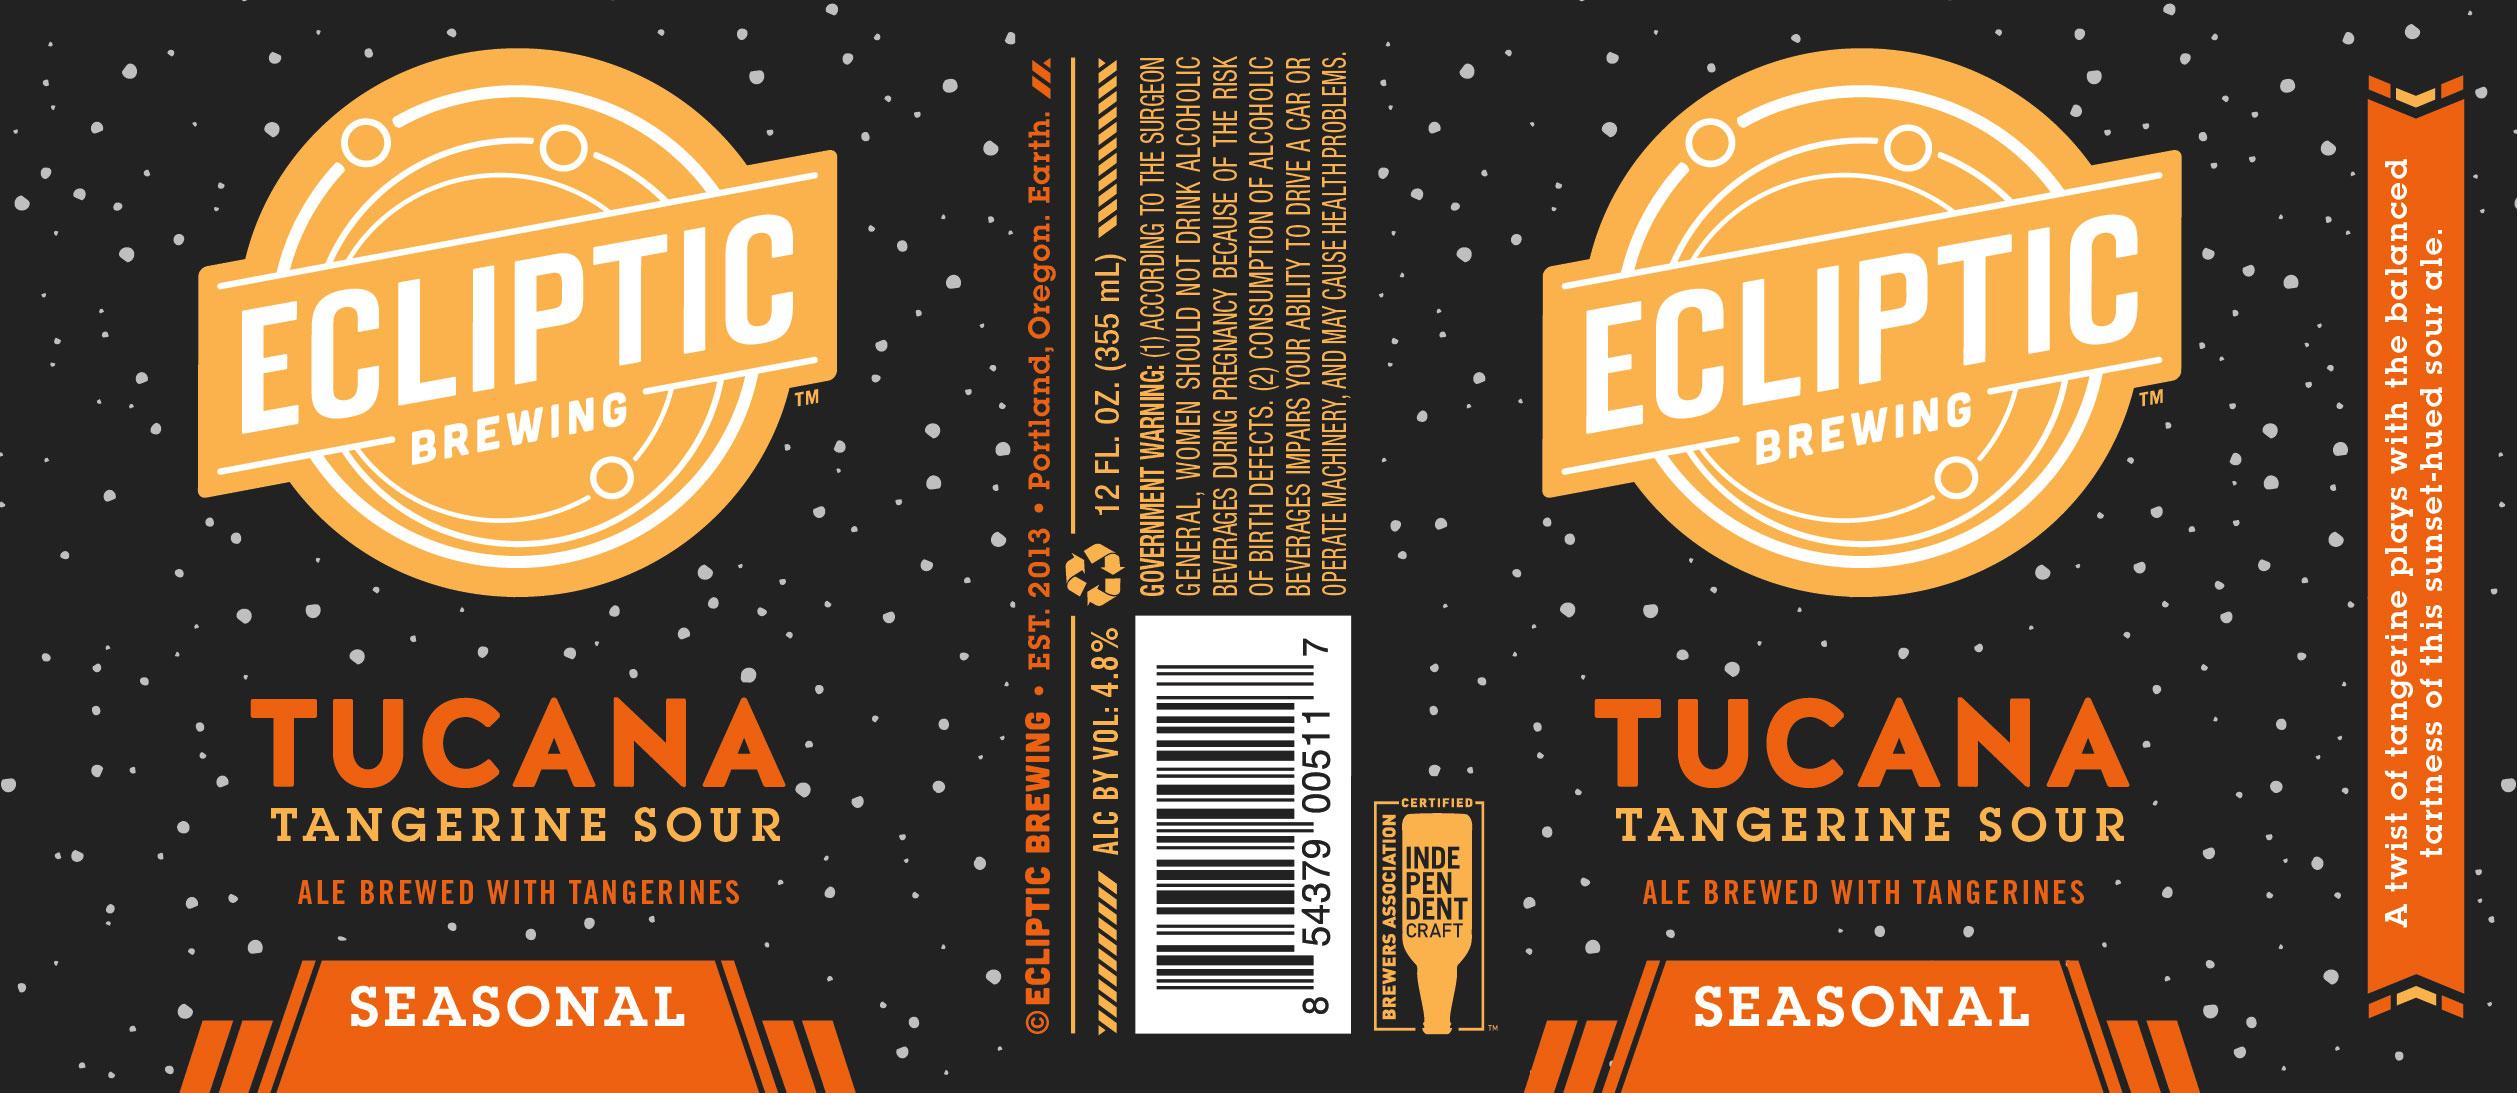 Ecliptic Brewing Tucana Tangerine Sour Ale Label